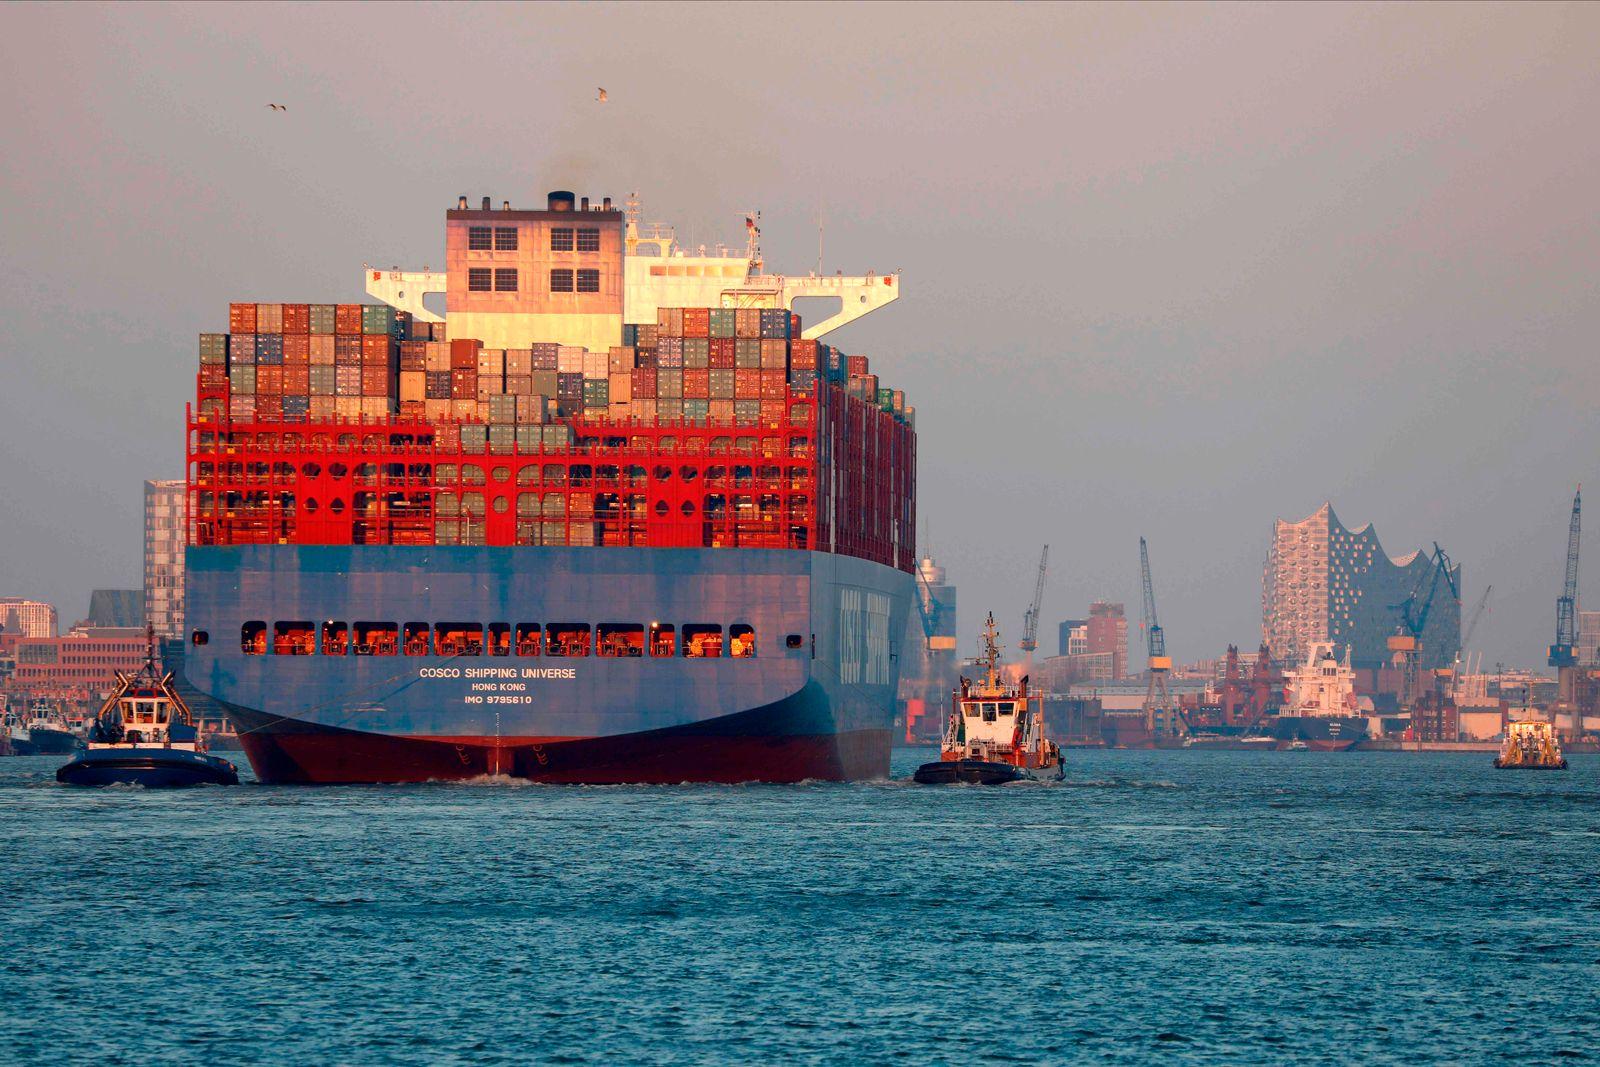 GERMANY-HEALTH-VIRUS-ECONOMY-TRANSPORT-SHIPING